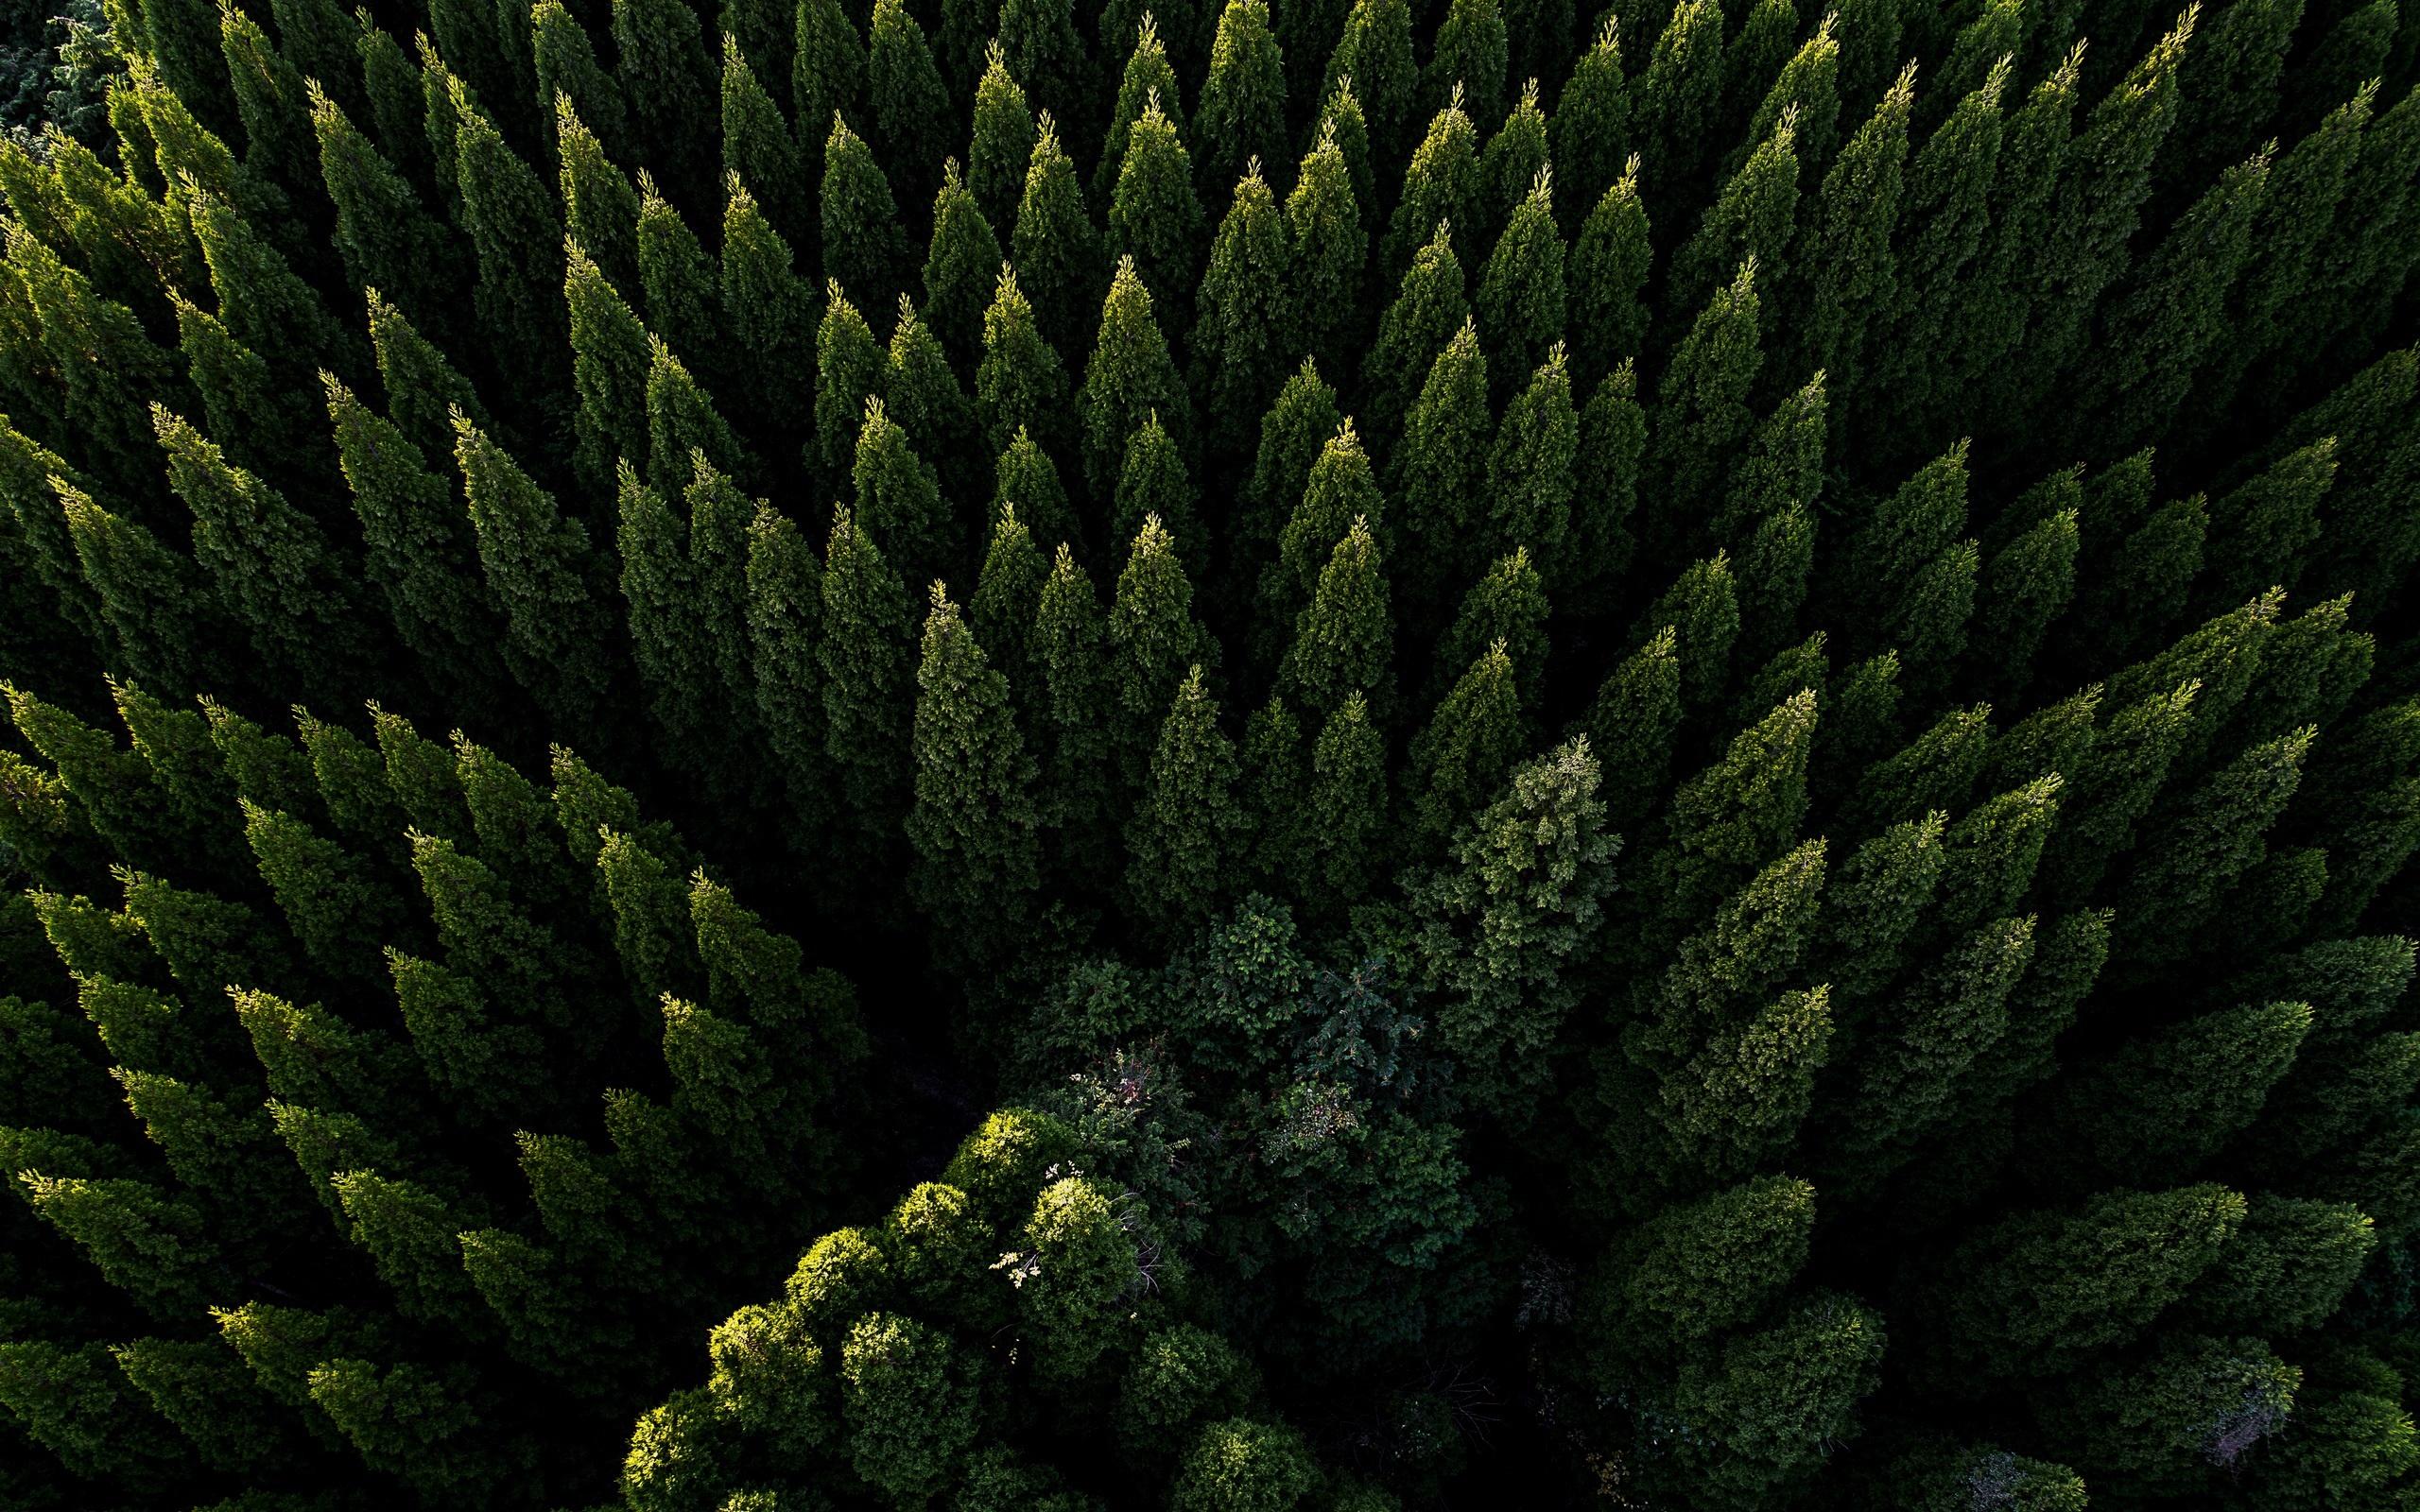 Iphone 11 Pro Wallpaper 4k Forest - HD Wallpaper